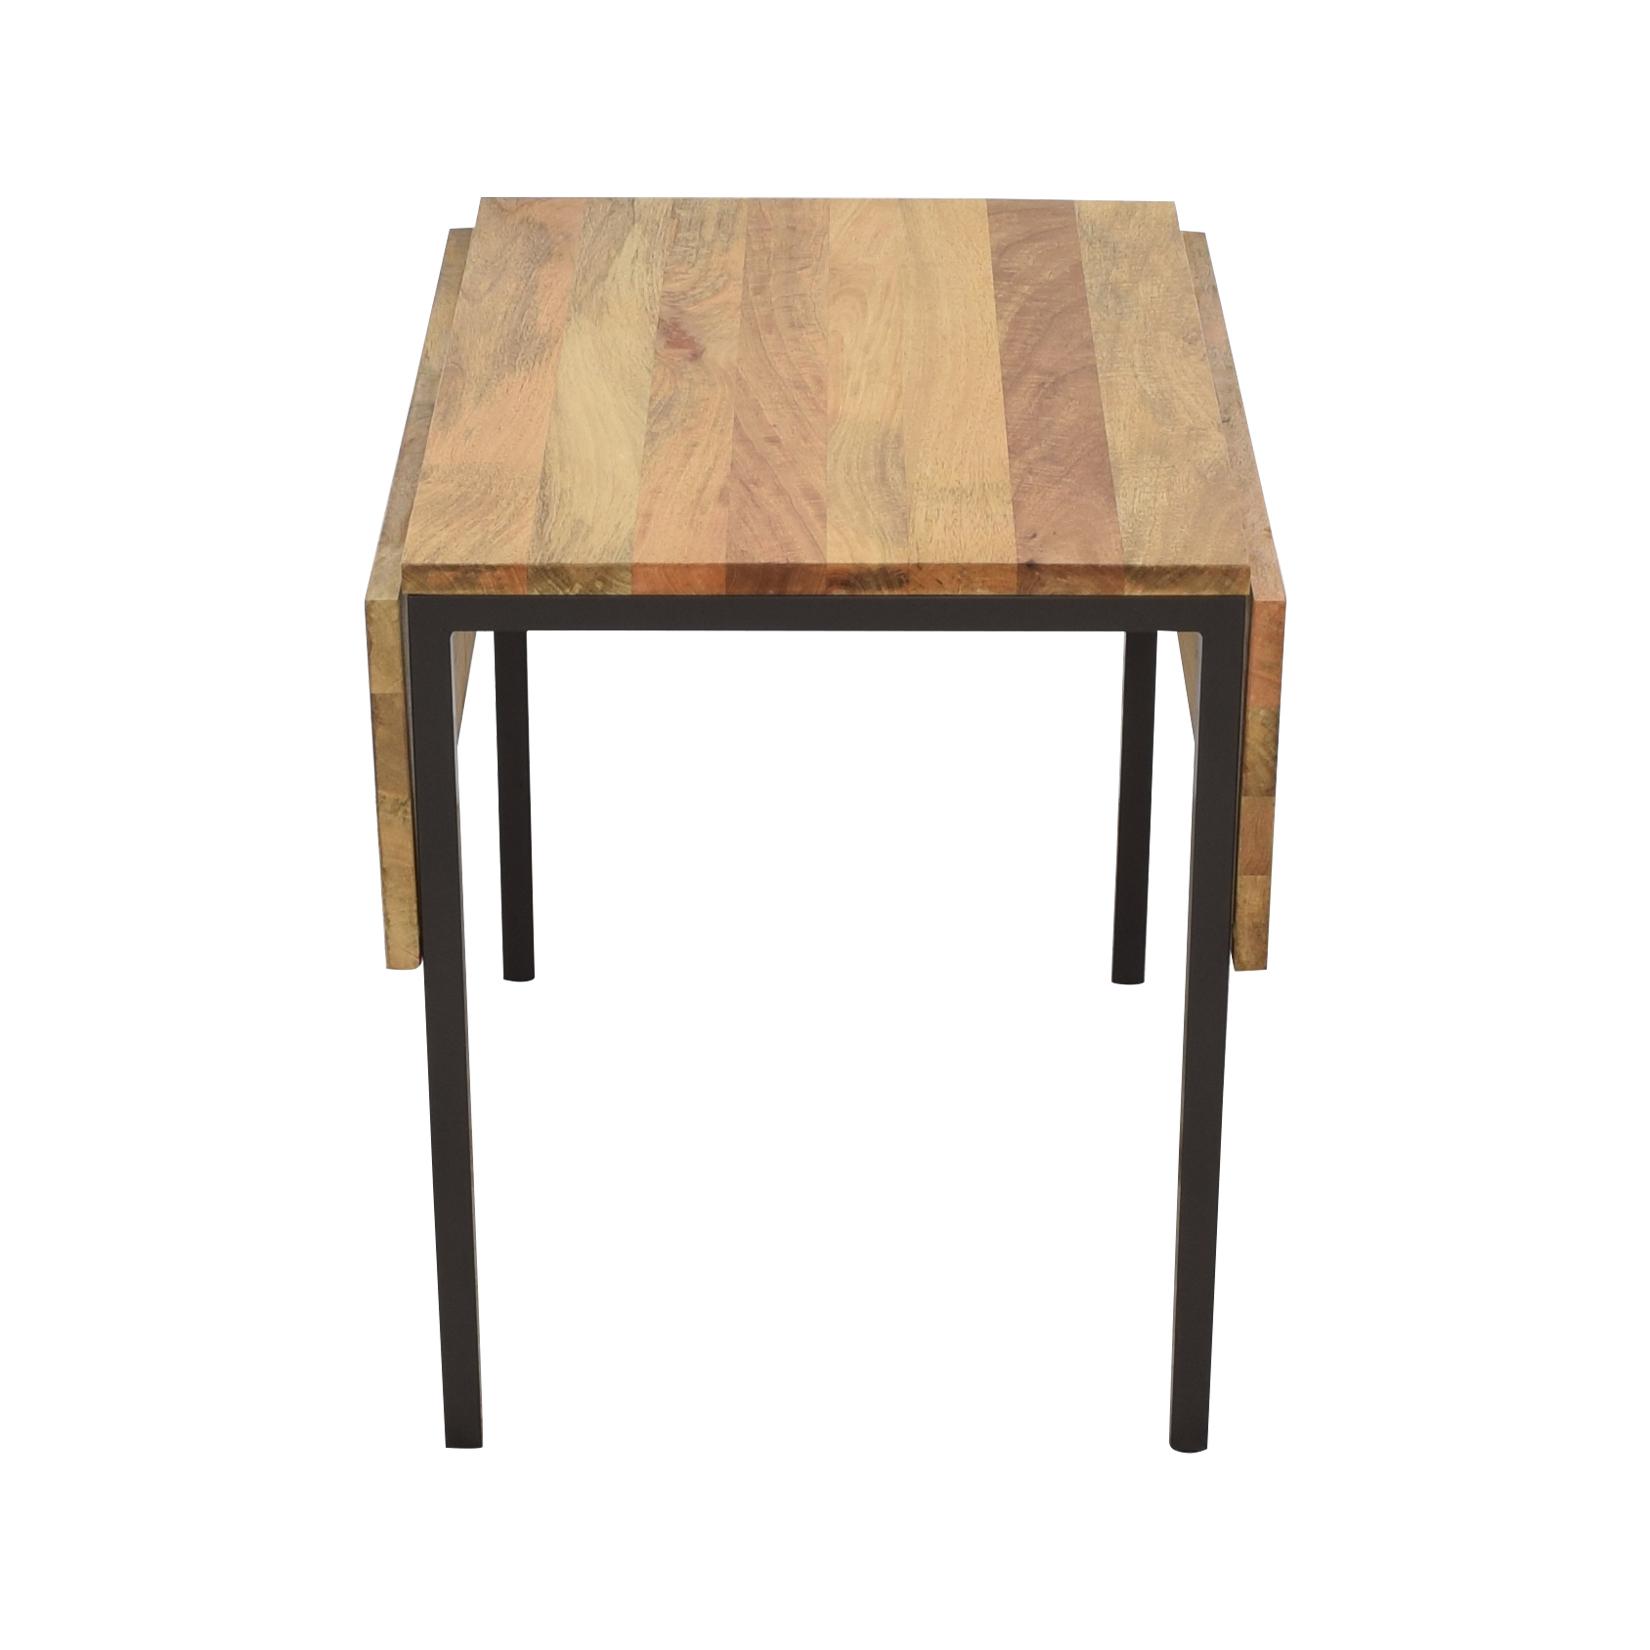 West Elm West Elm Box Frame Drop Leaf Dining Table discount